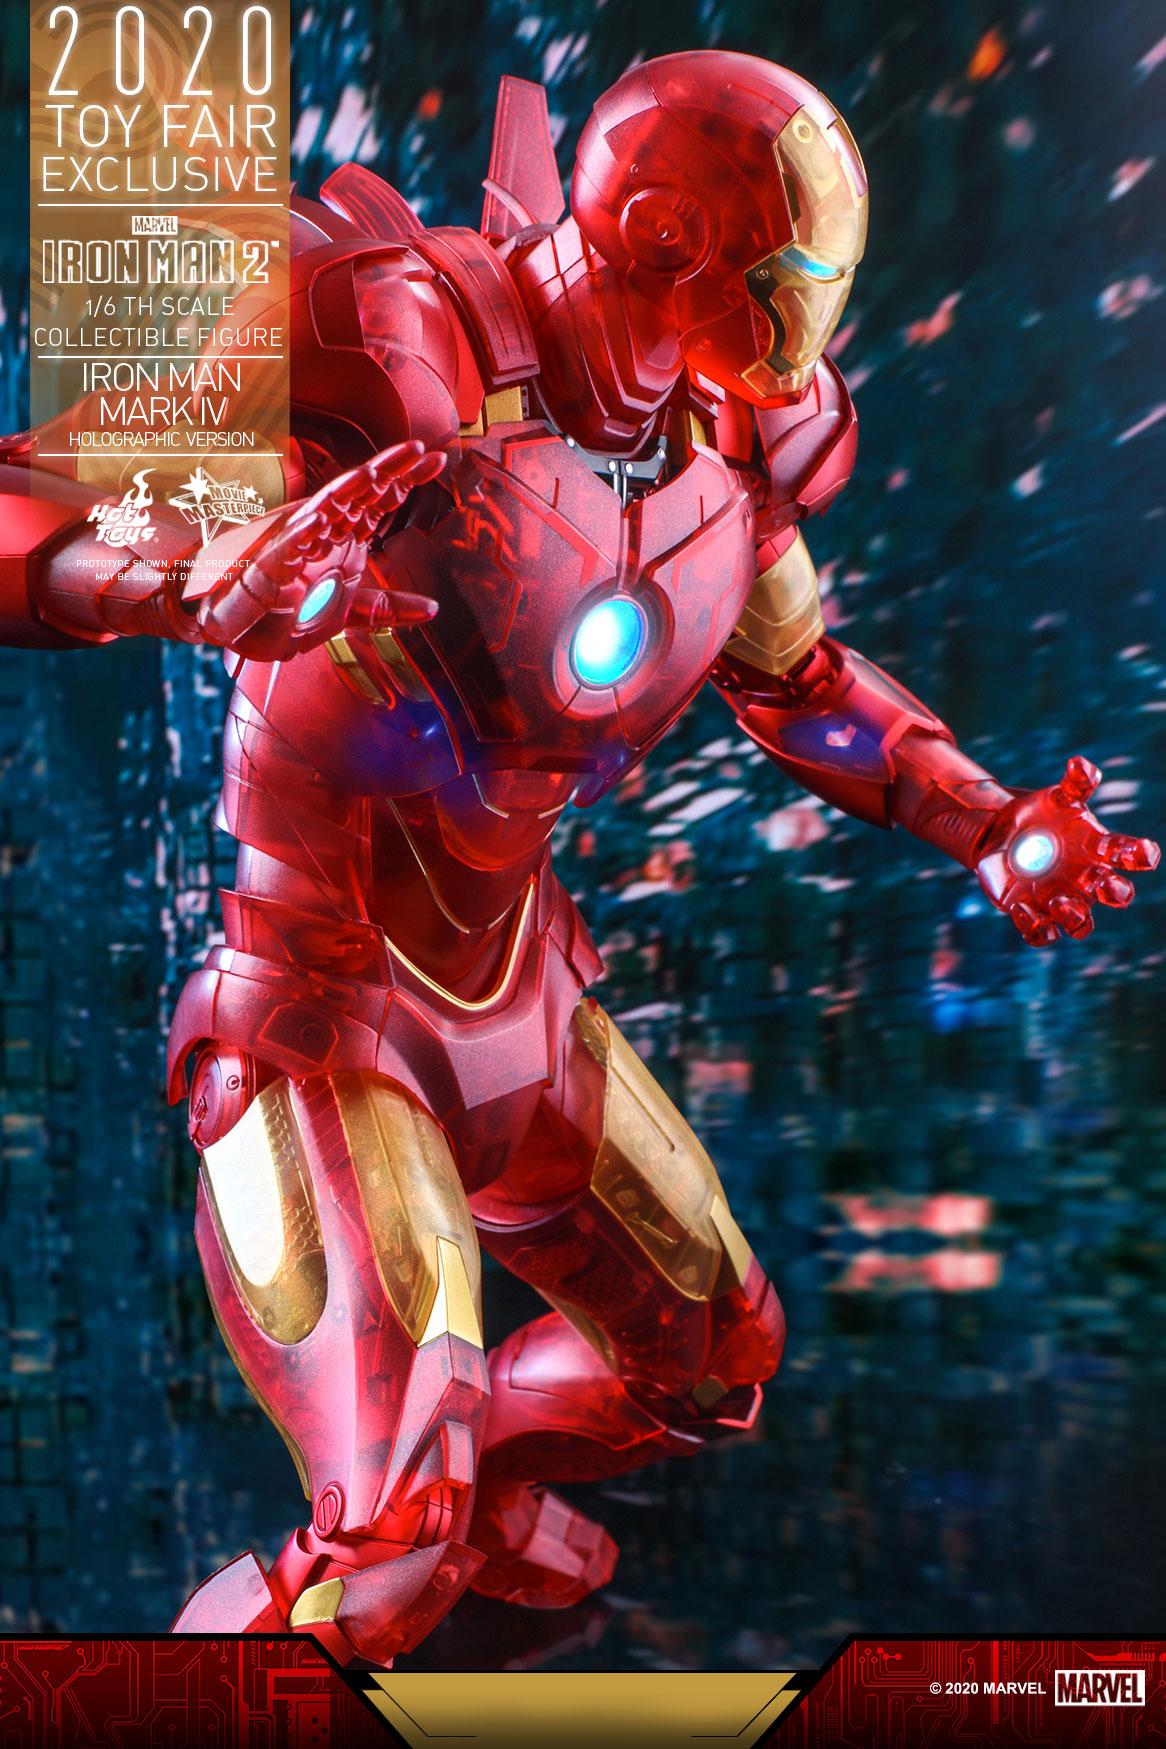 Hot Toys - IM2 - Iron Man Mark IV (Holographic Version) collectible figure_PR14